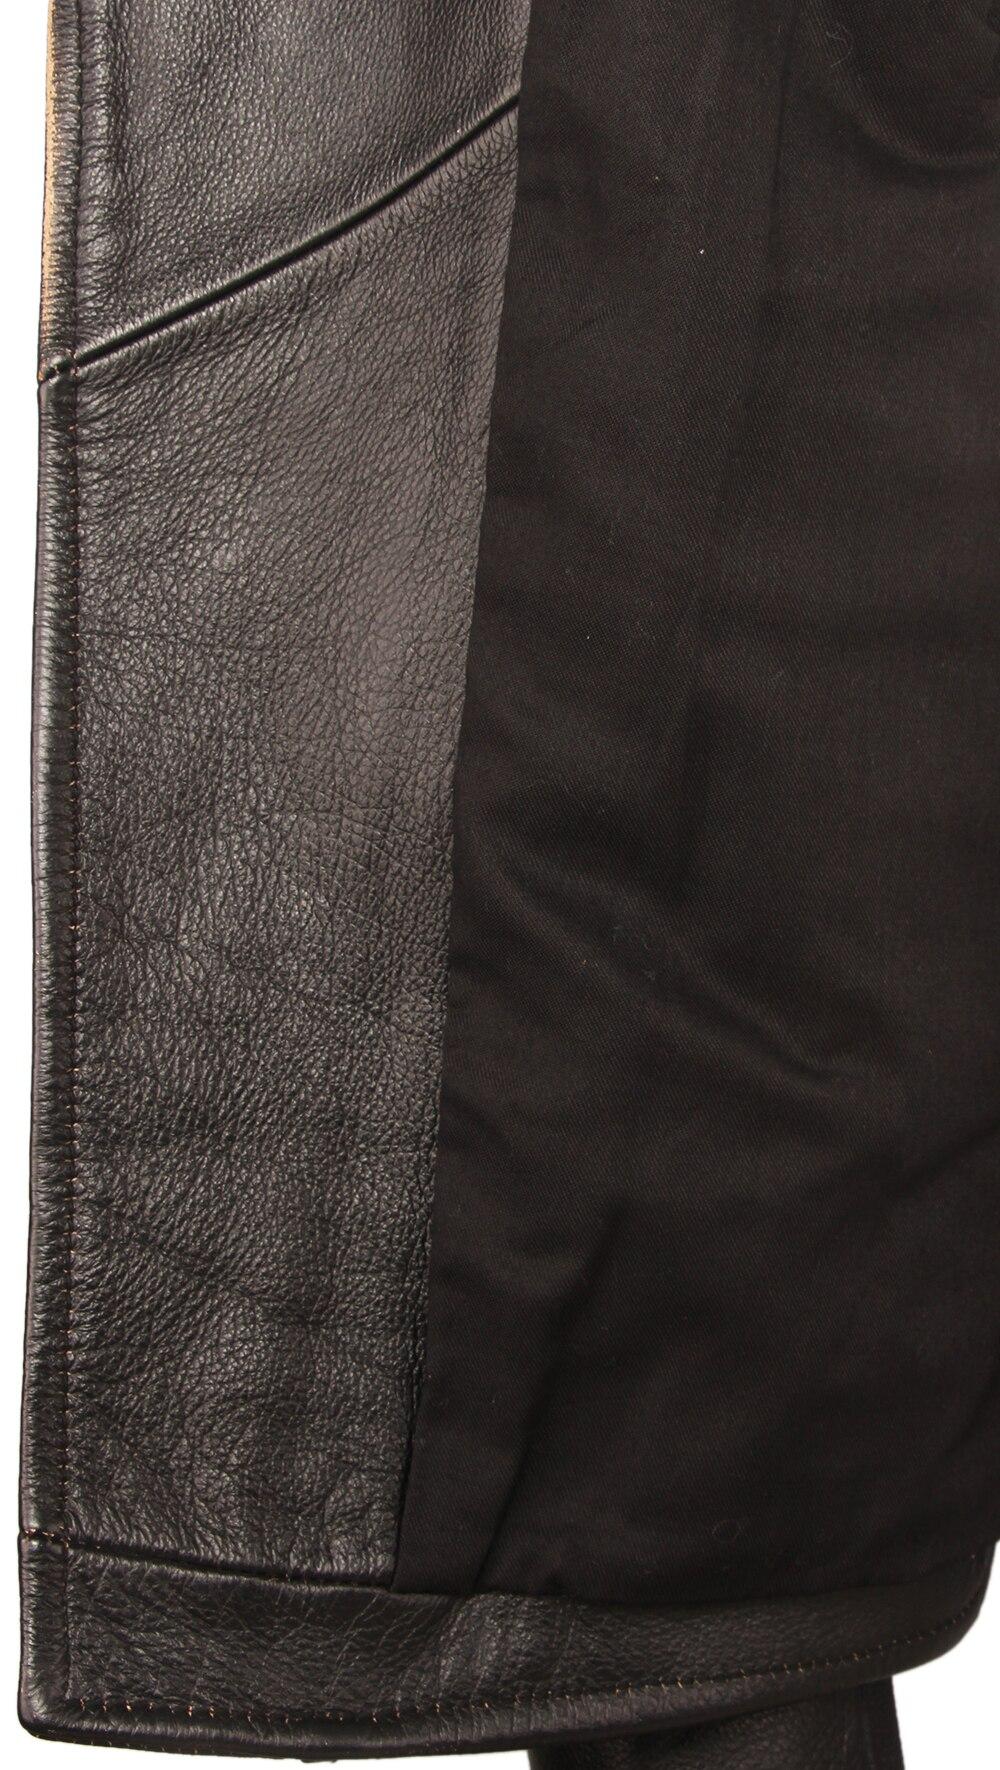 He945e0e38705453b871c971dbc9c0928G Vintage Motorcycle Jacket Men Leather Jackets Thick 100% Cowhide Genuine Leather Coat Winter Biker Jacket Moto Clothing M456